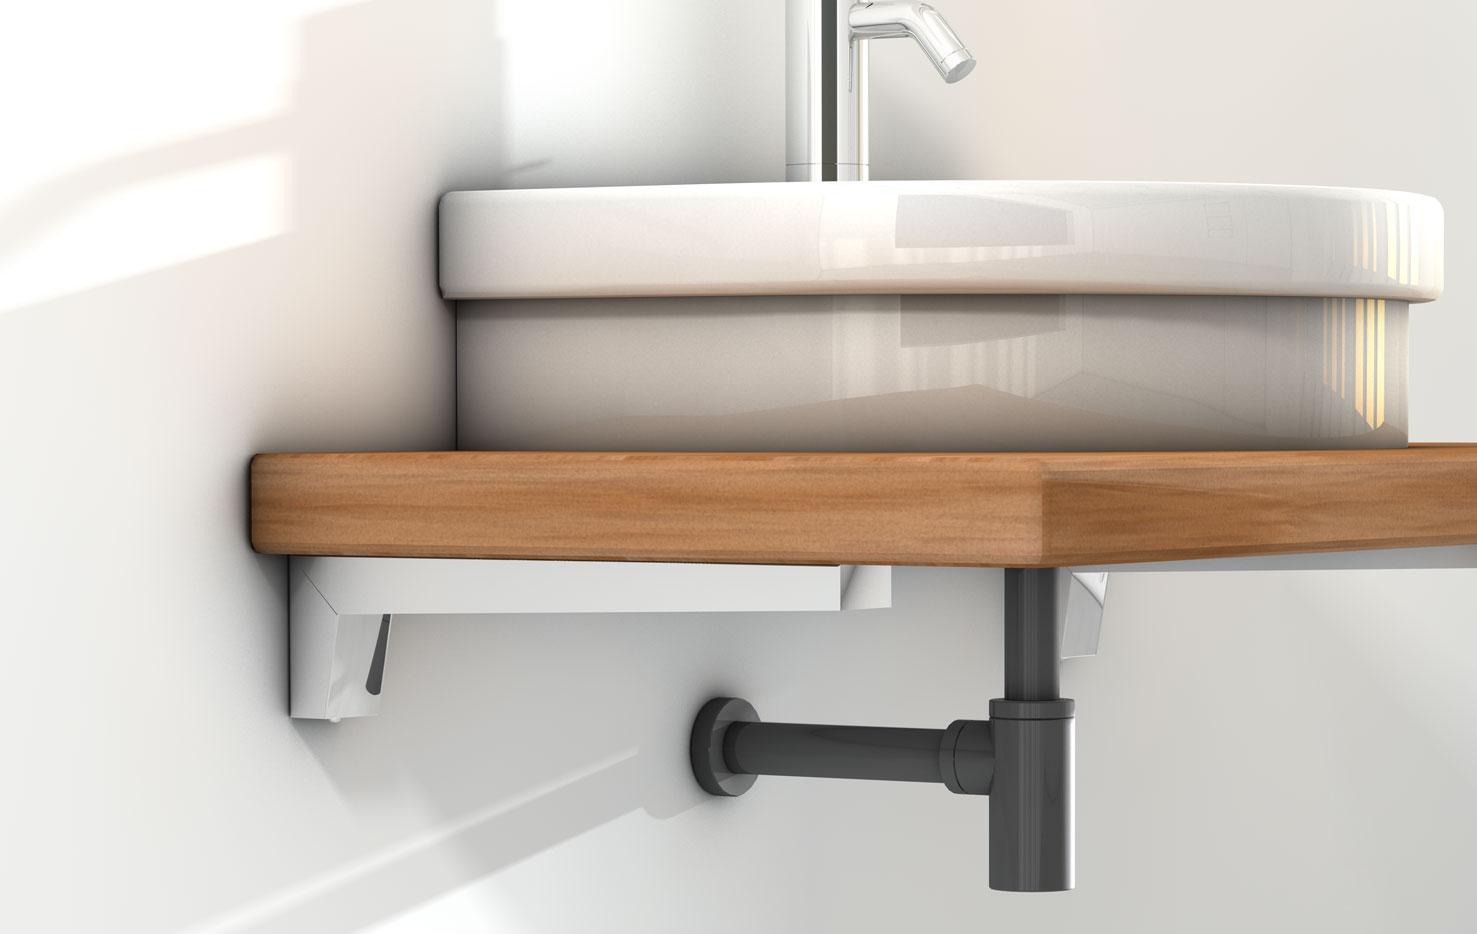 Mensola lavabo for Mensola lavabo ikea